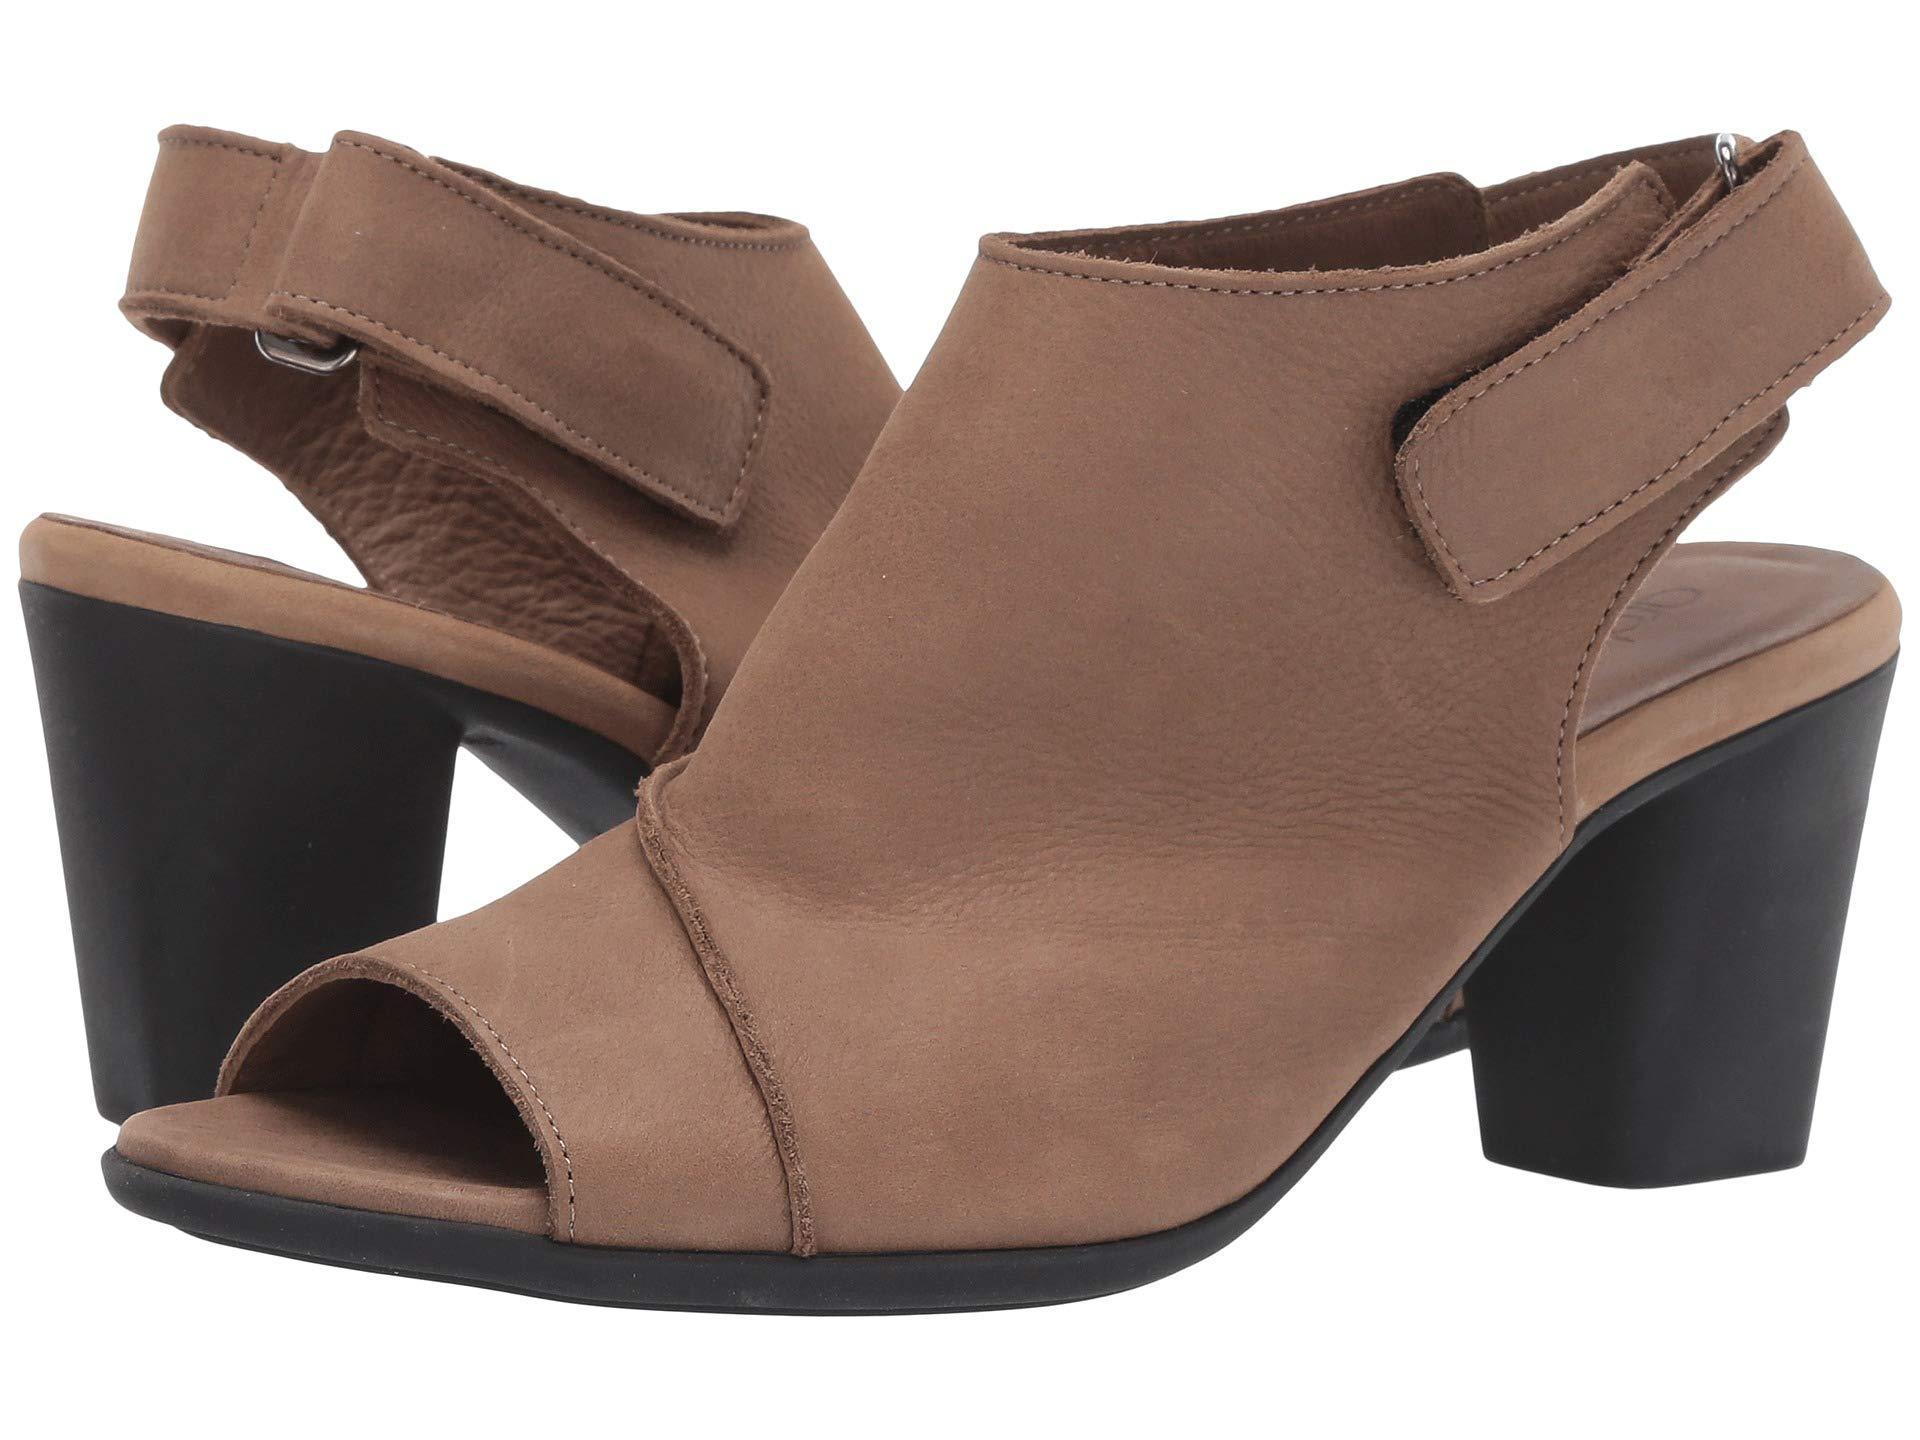 453d173c3 Lyst - Arche Faraon (grey) Women s Sandals